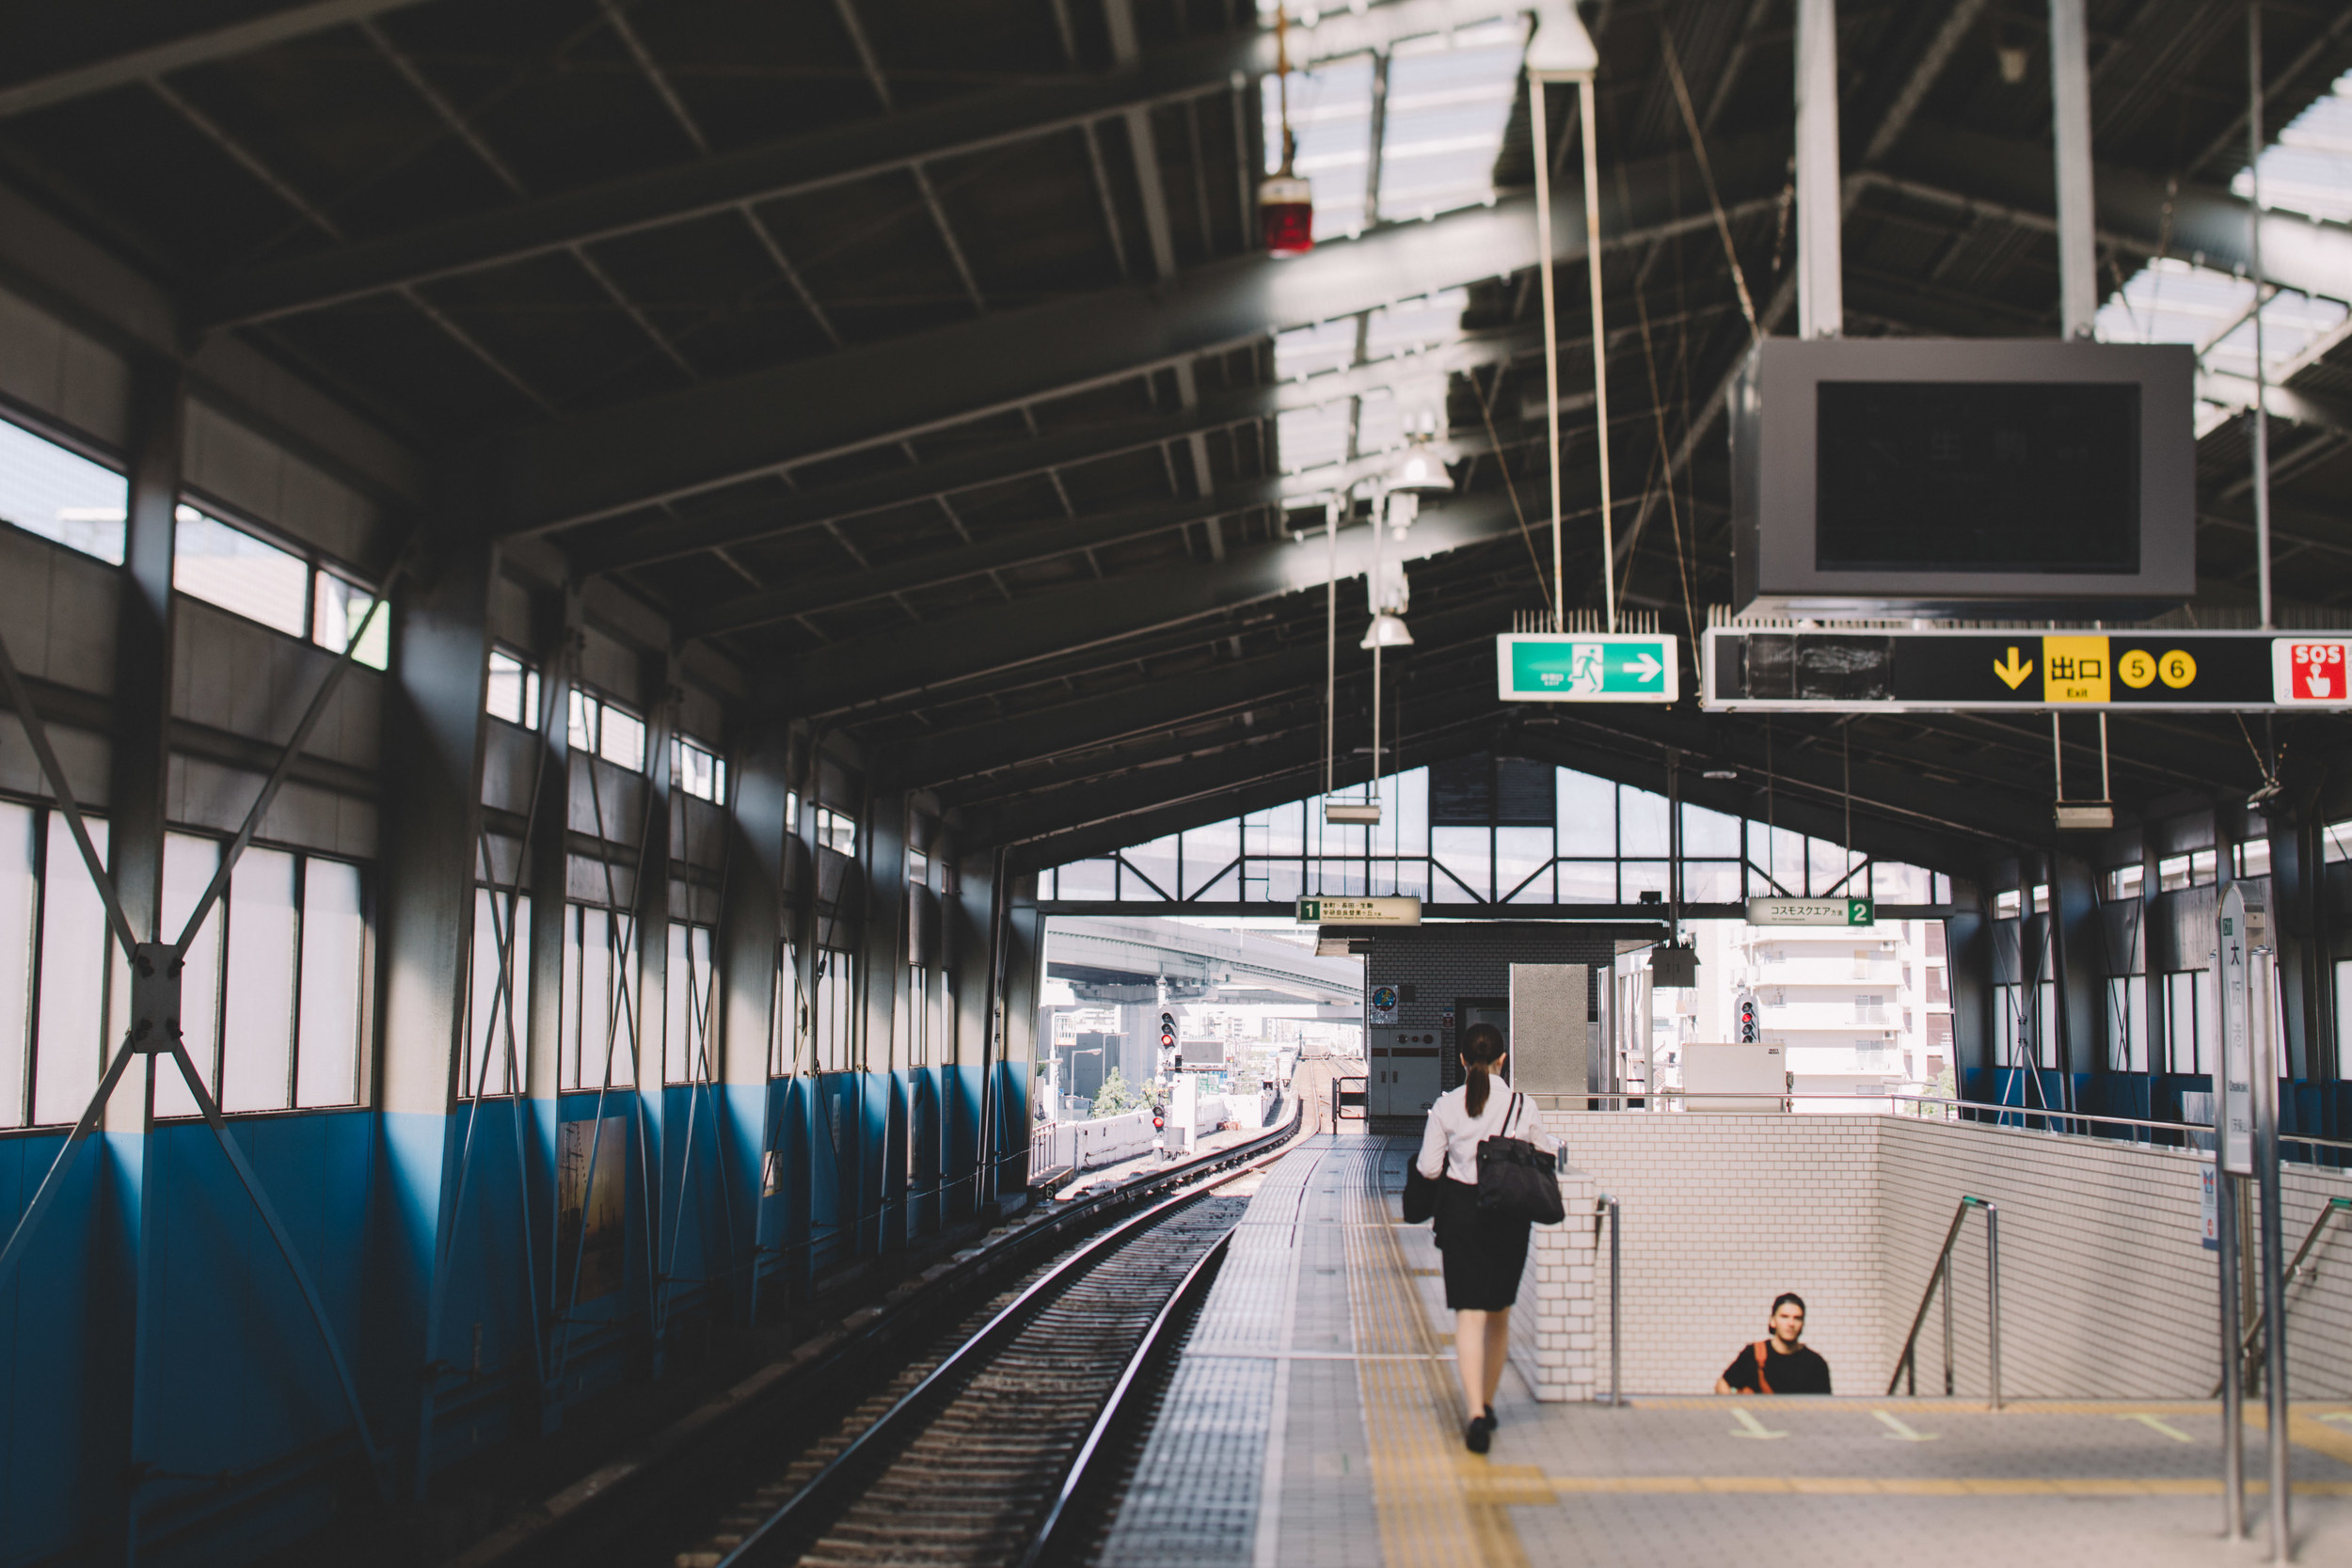 Japan, DC Photography, Dan Chern Photography, Bay Area Photography, Wedding Photography, Travel, Travel Photography, Tokyo, Kyoto, Odaiba, Osaka, Osaka Aquarium, Subway Station, Rail Station